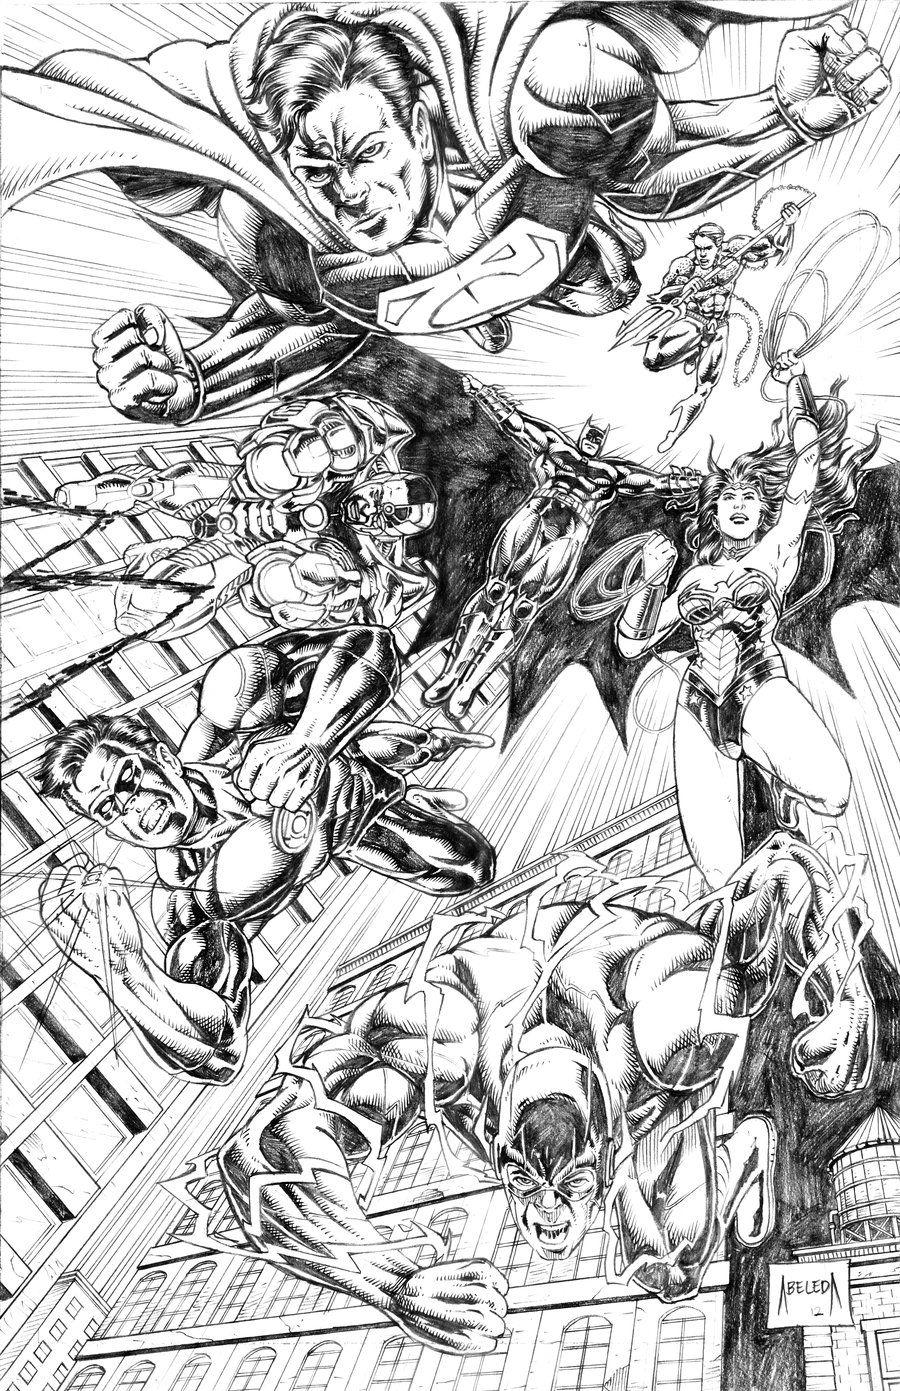 Justice League By Mannieboy On Deviantart Superhero Coloring Pages Justice League Superhero Coloring